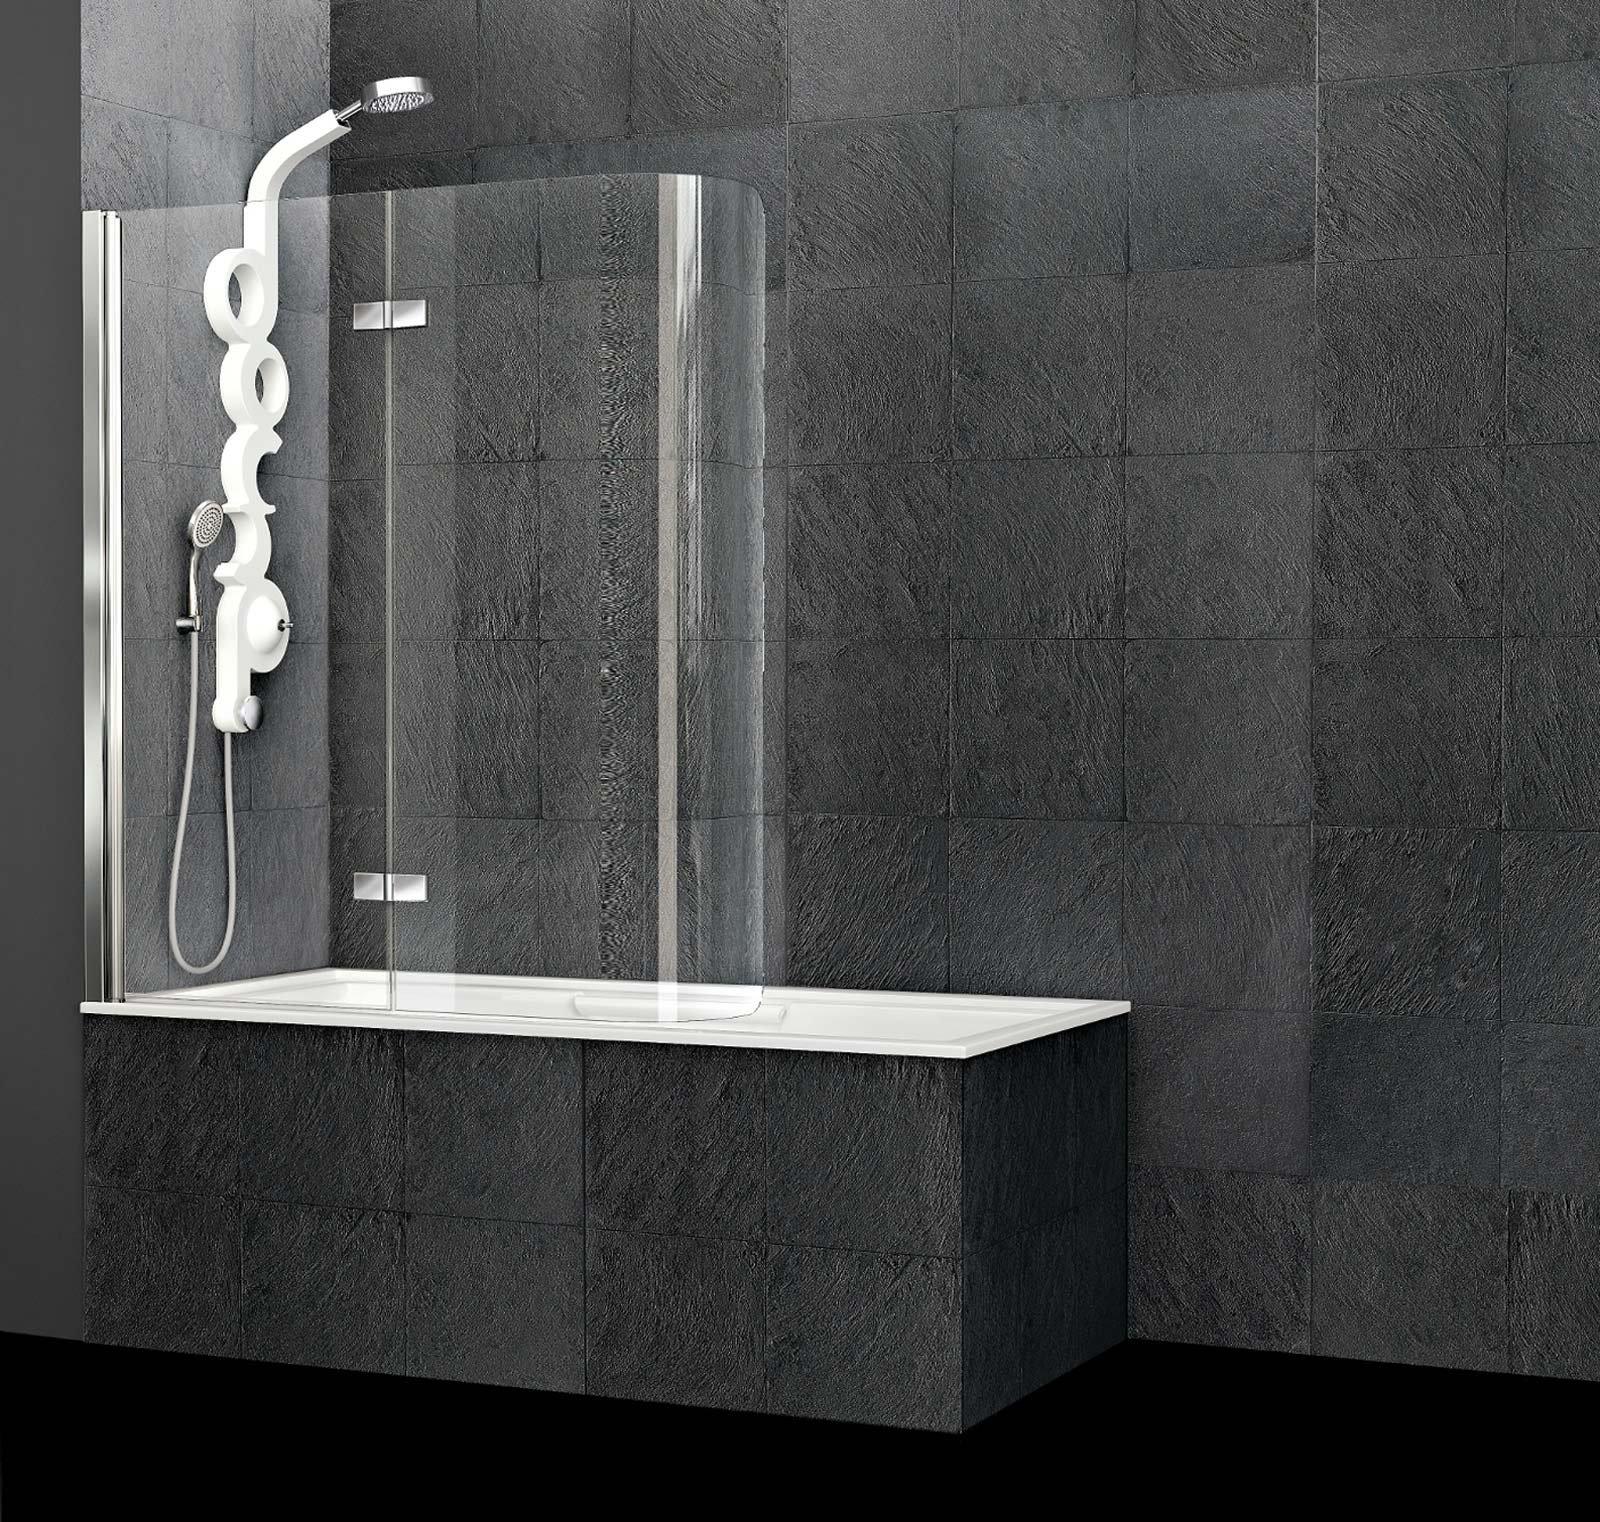 Vasca e doccia insieme cose di casa - Vasca da bagno in vetro ...